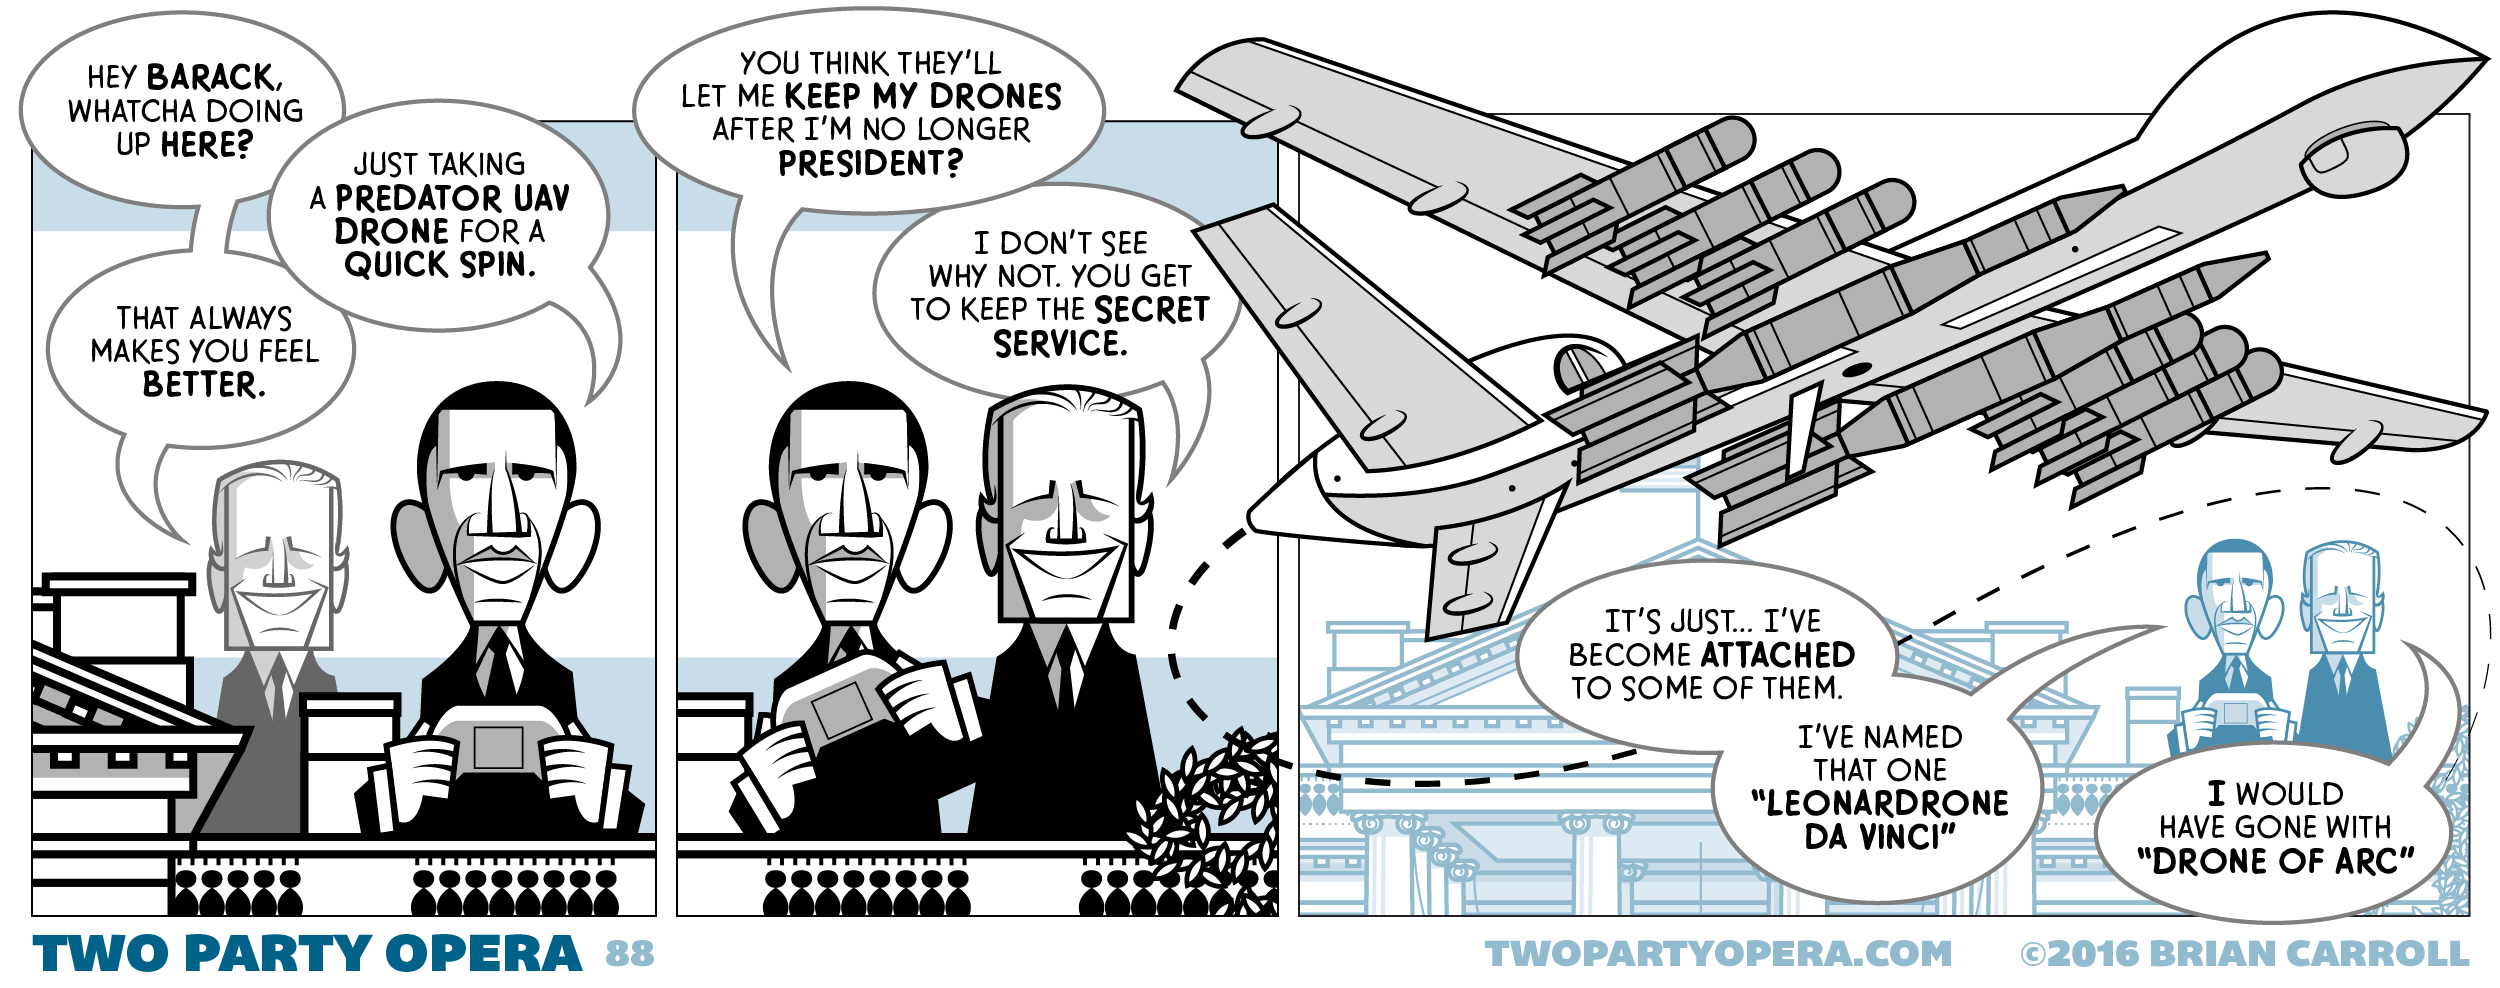 The Drone Ranger